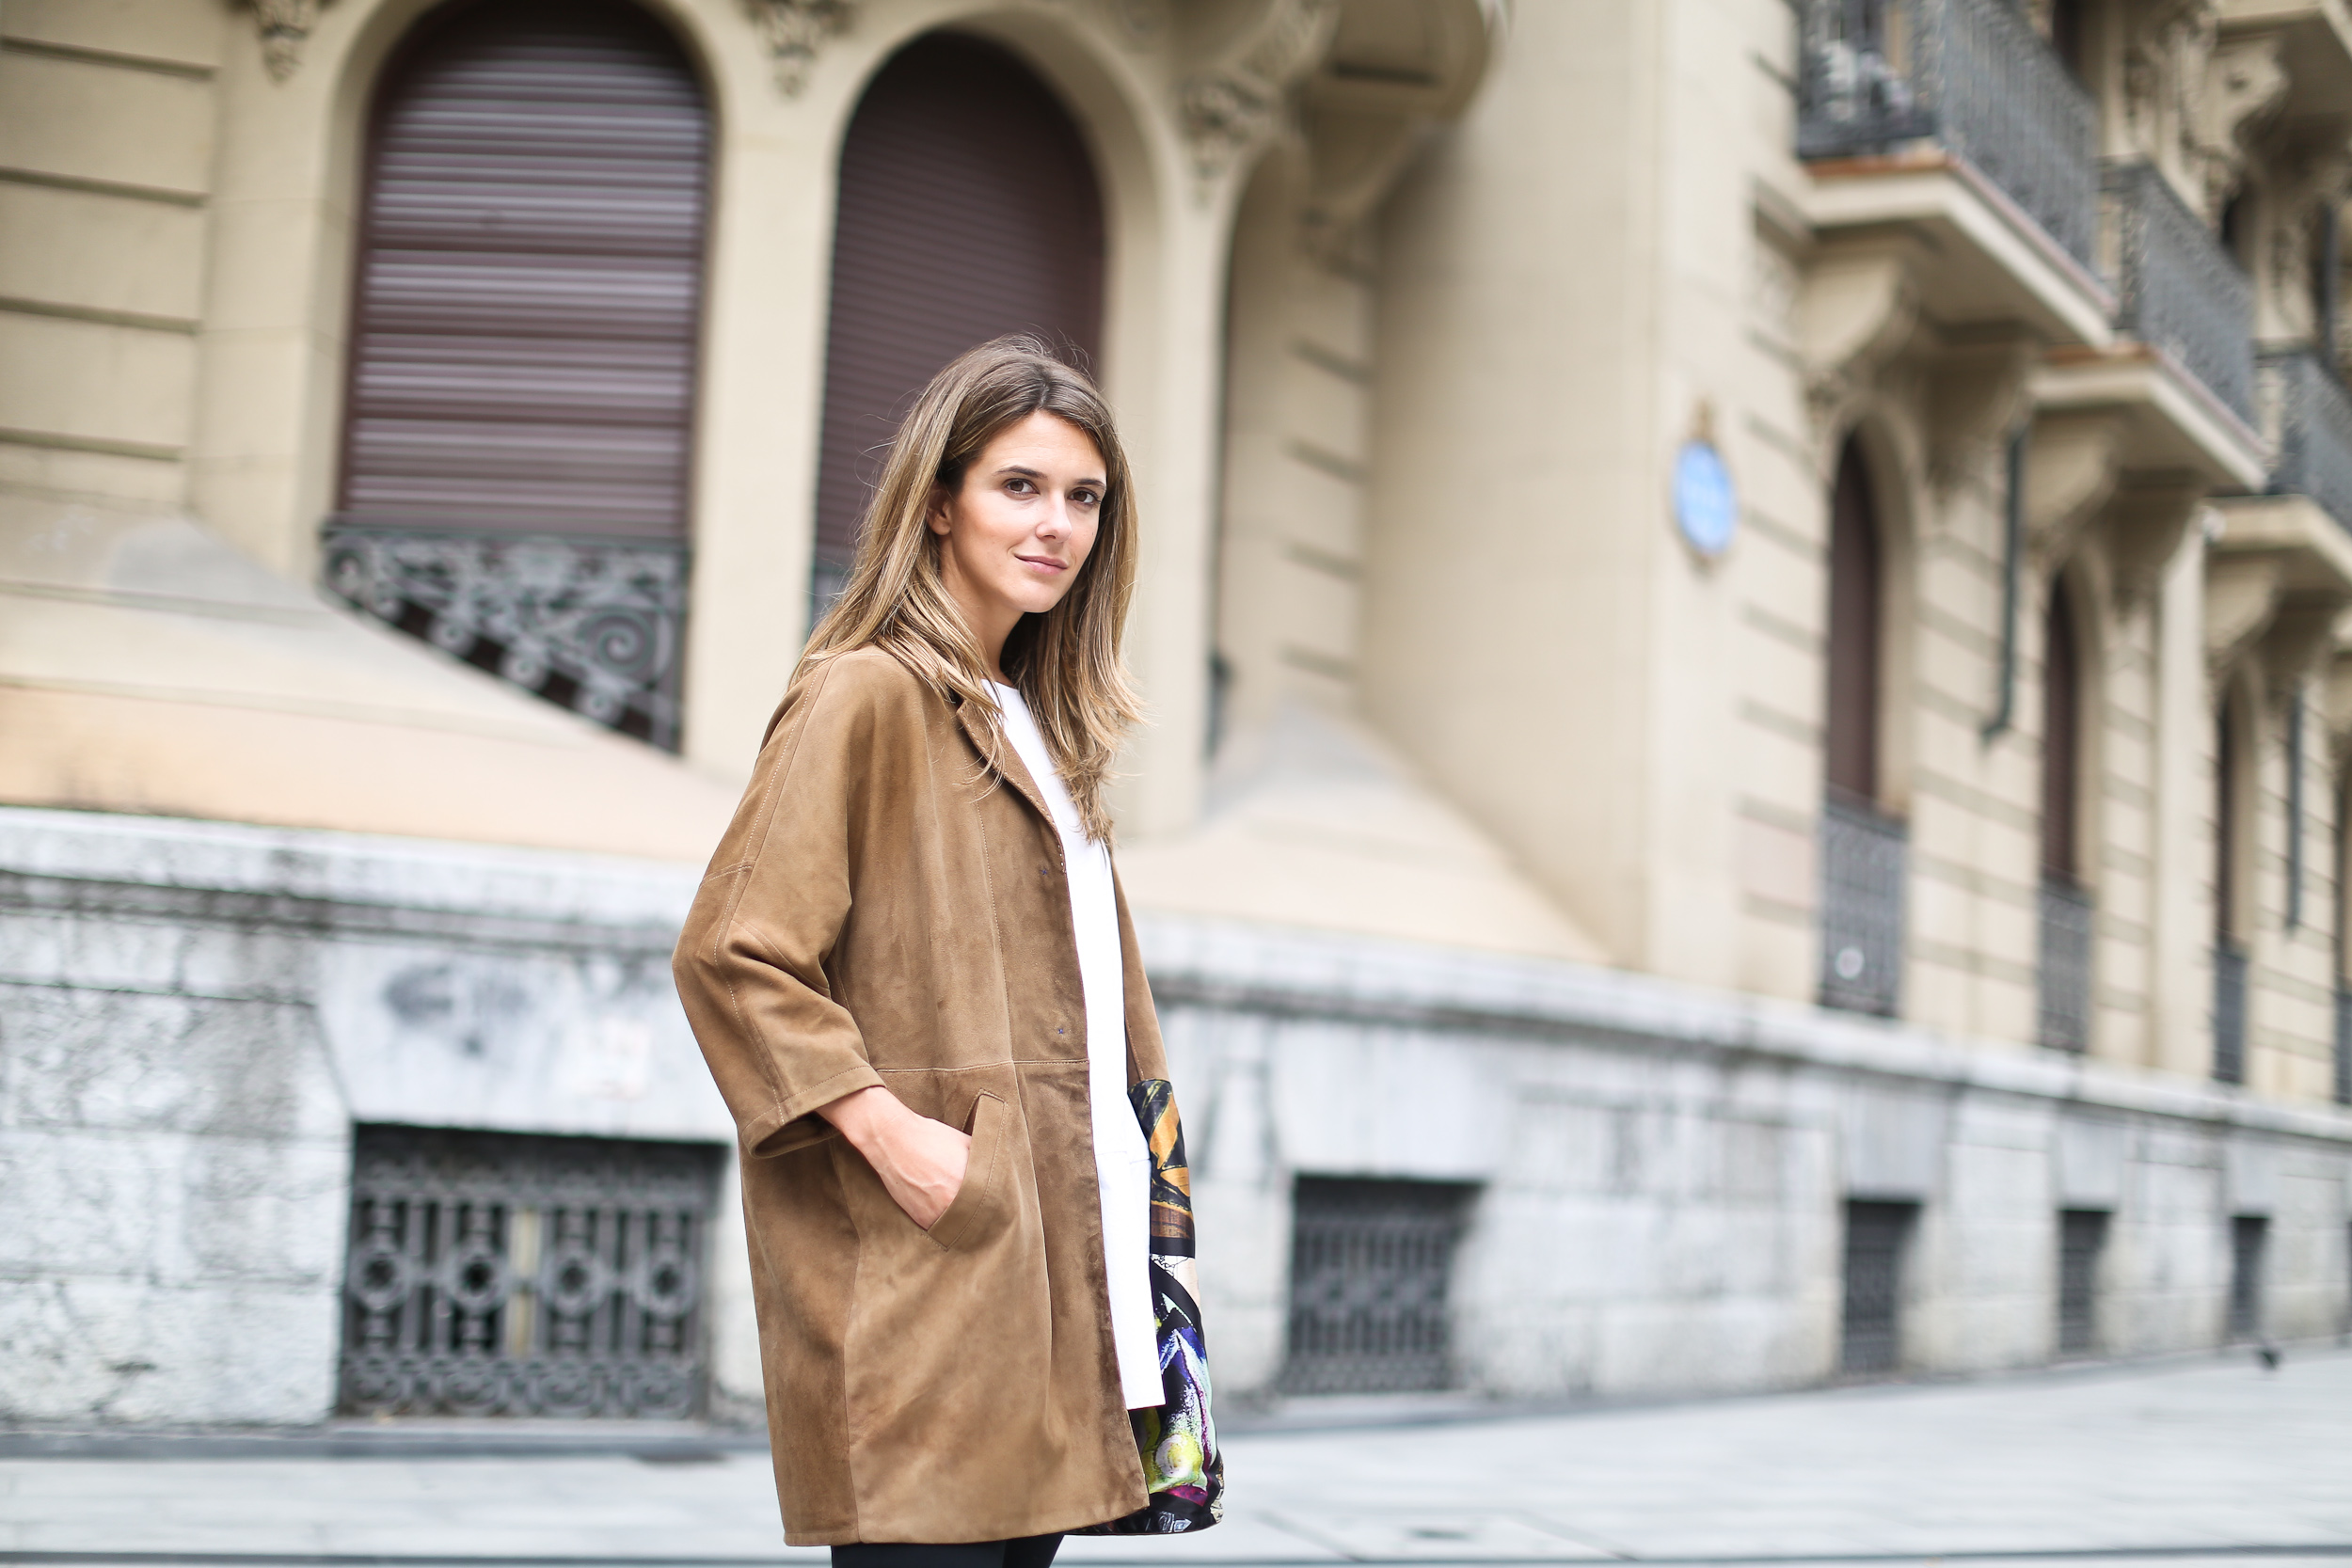 Clochet_streetstyle_boxcalf_chaqueta_ante_platform_brogues_masur_gavriel_bucket_bag-10